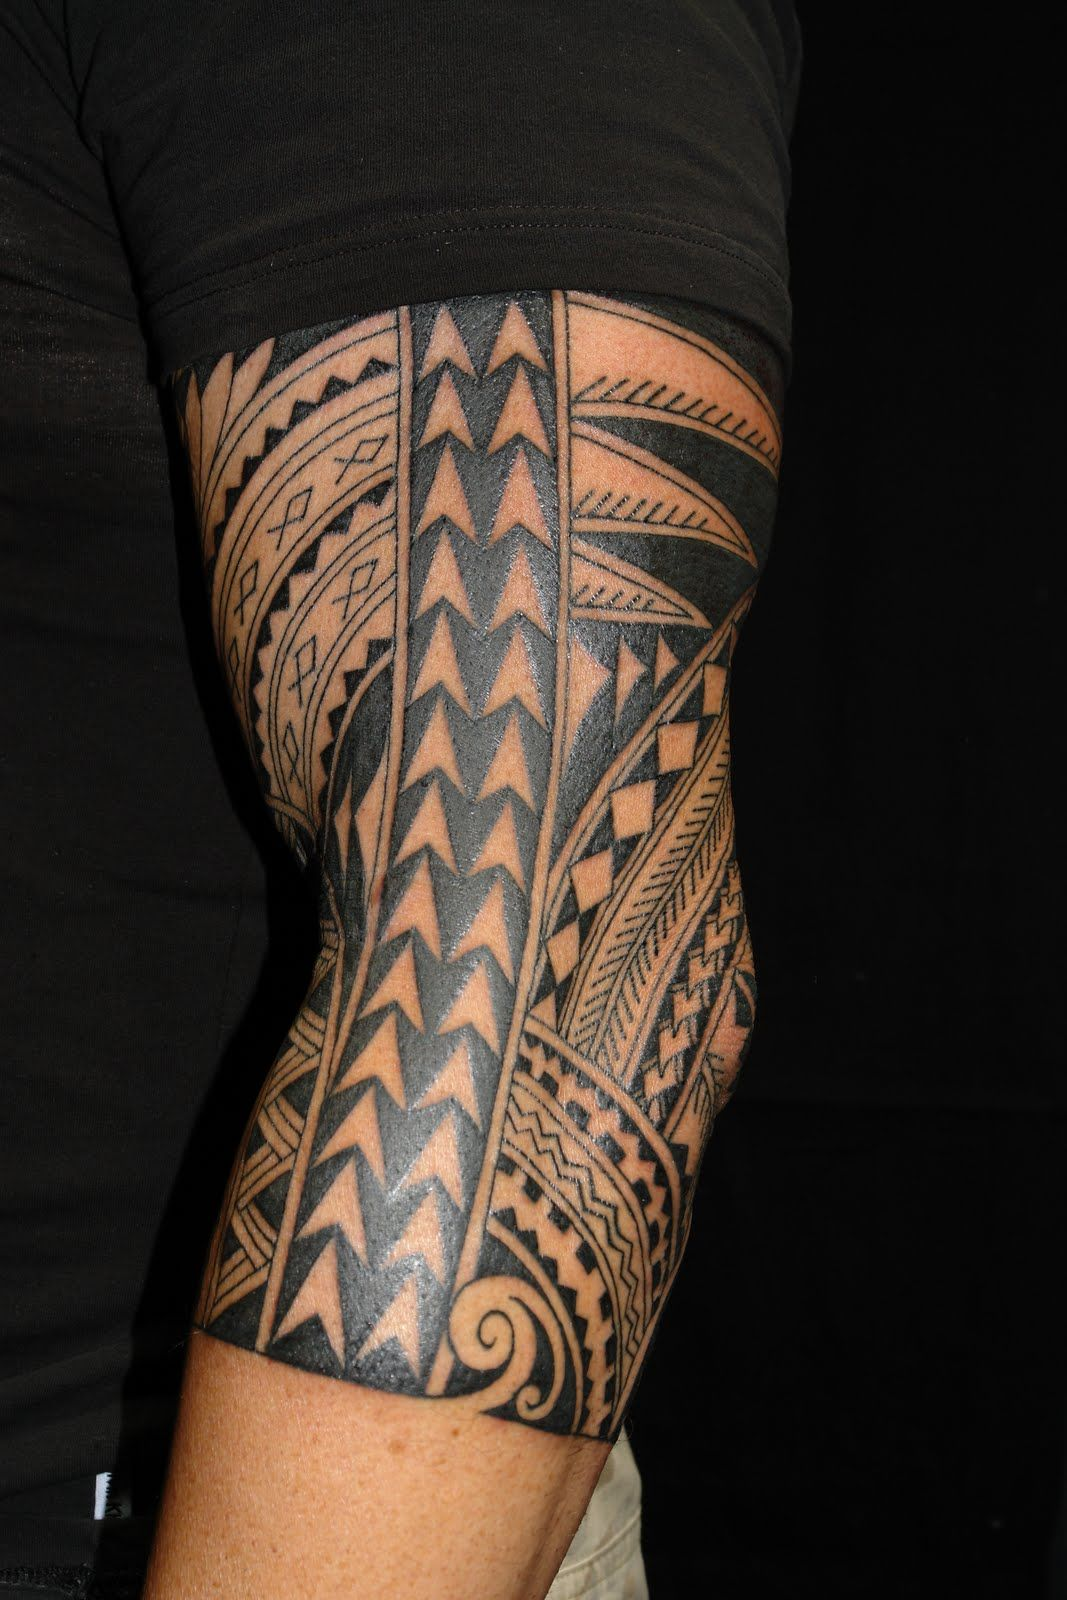 vintagehawaiian tattoo pinterest tattoo ideen. Black Bedroom Furniture Sets. Home Design Ideas